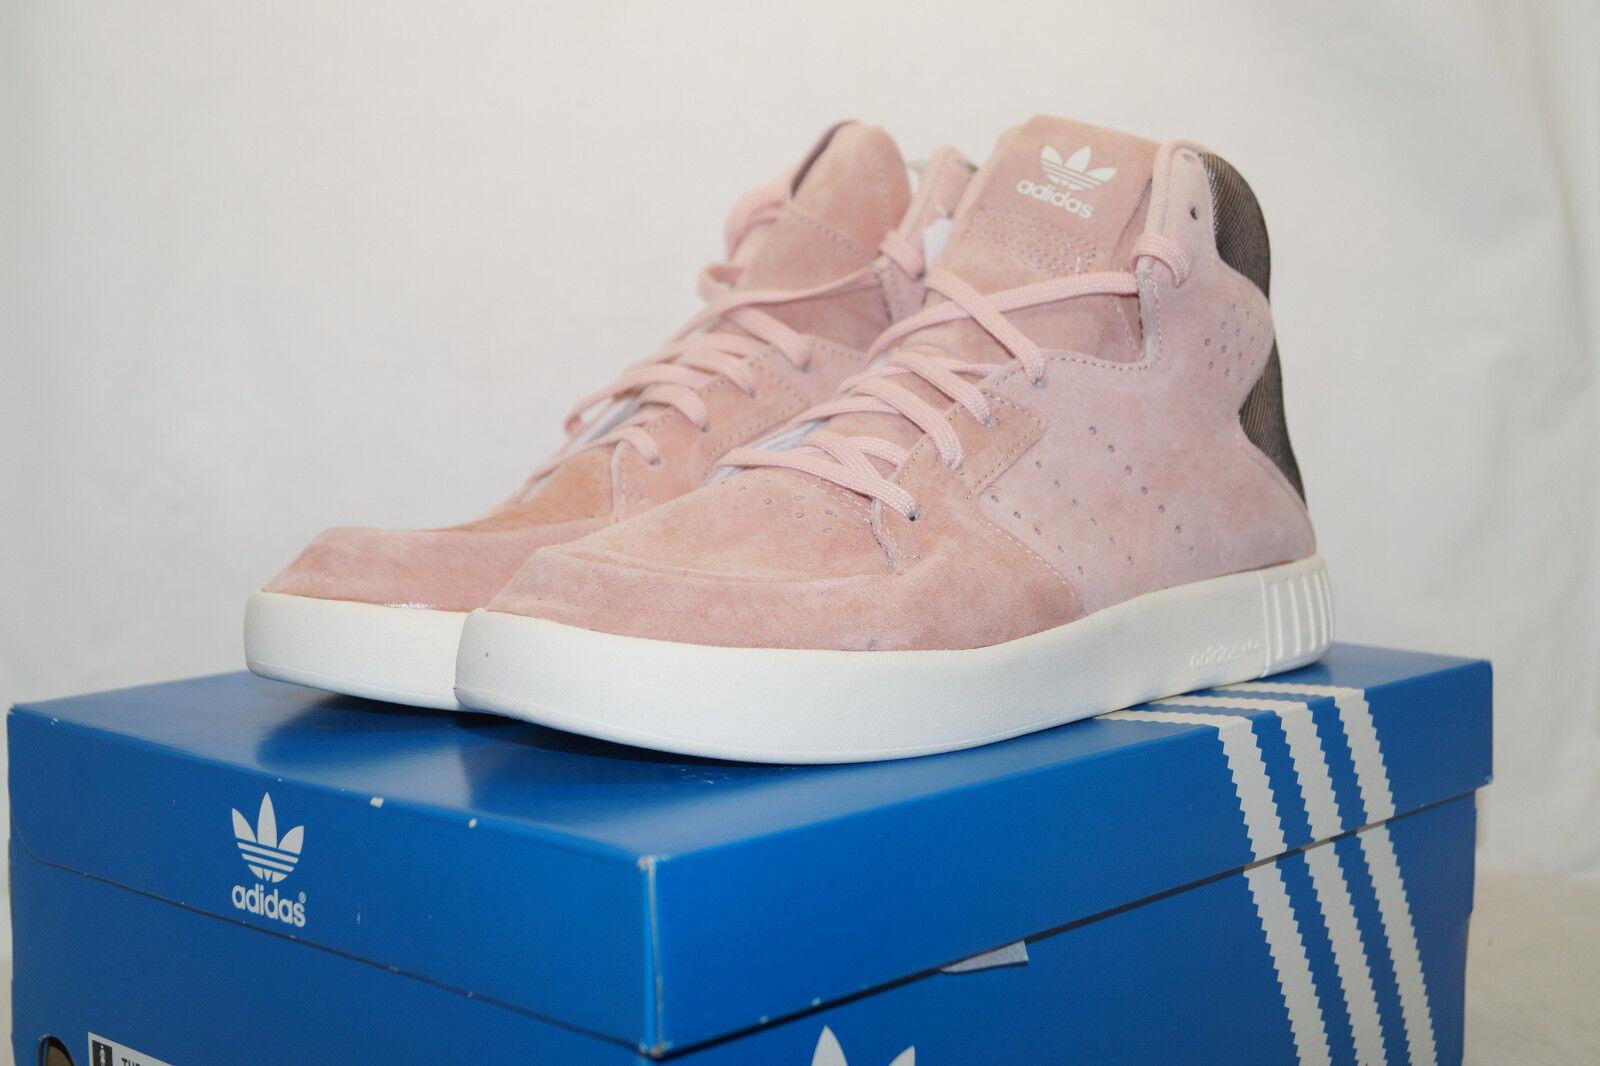 adidas originals TUBULAR INVADER 2.0 W 39.3 UK 6 pink S80555 Sneakers